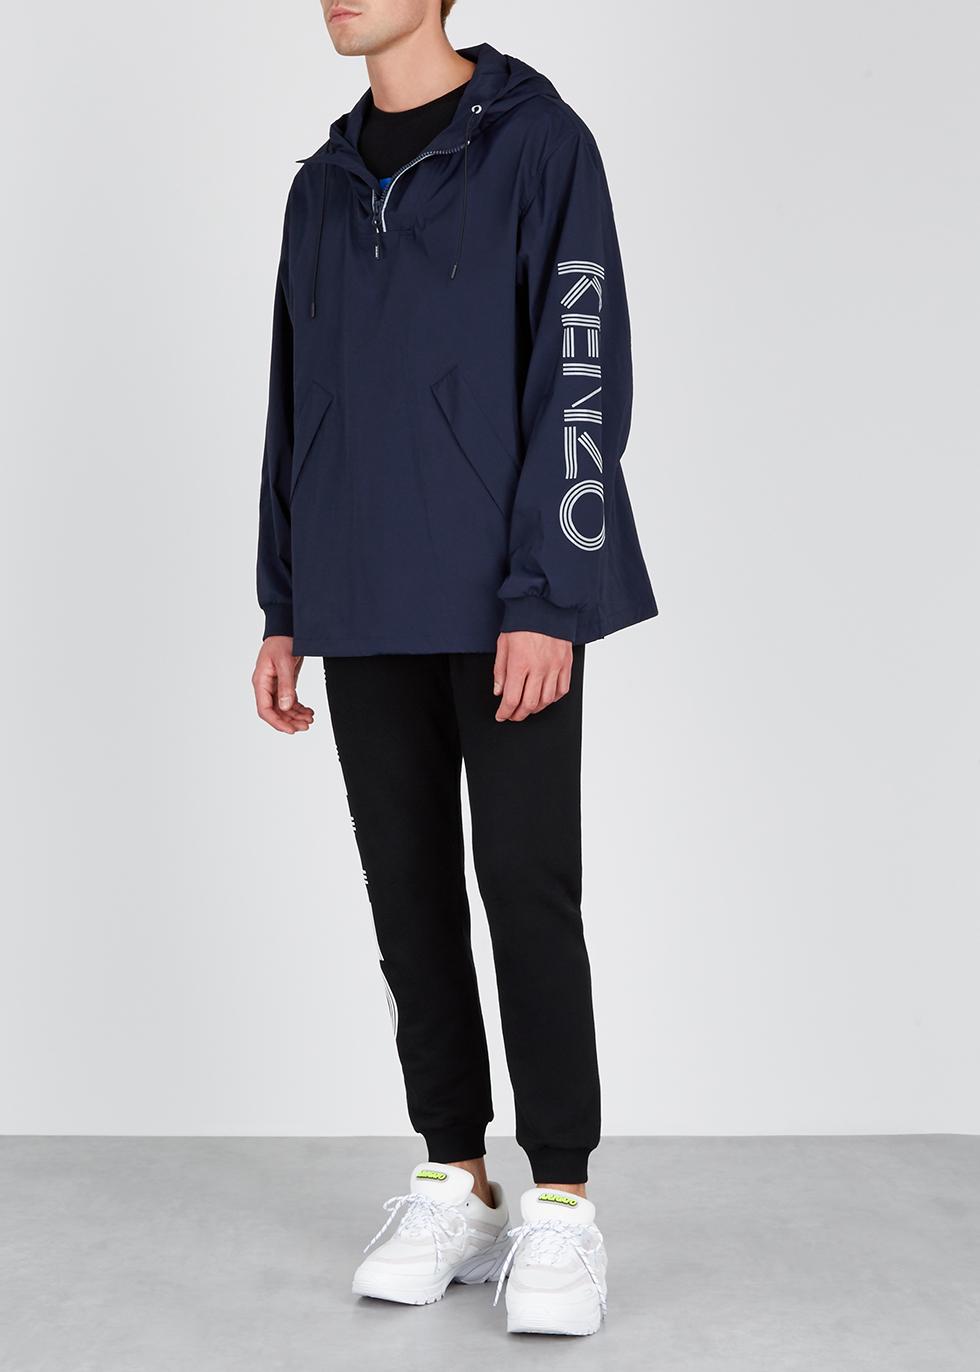 Navy logo shell jacket - Kenzo